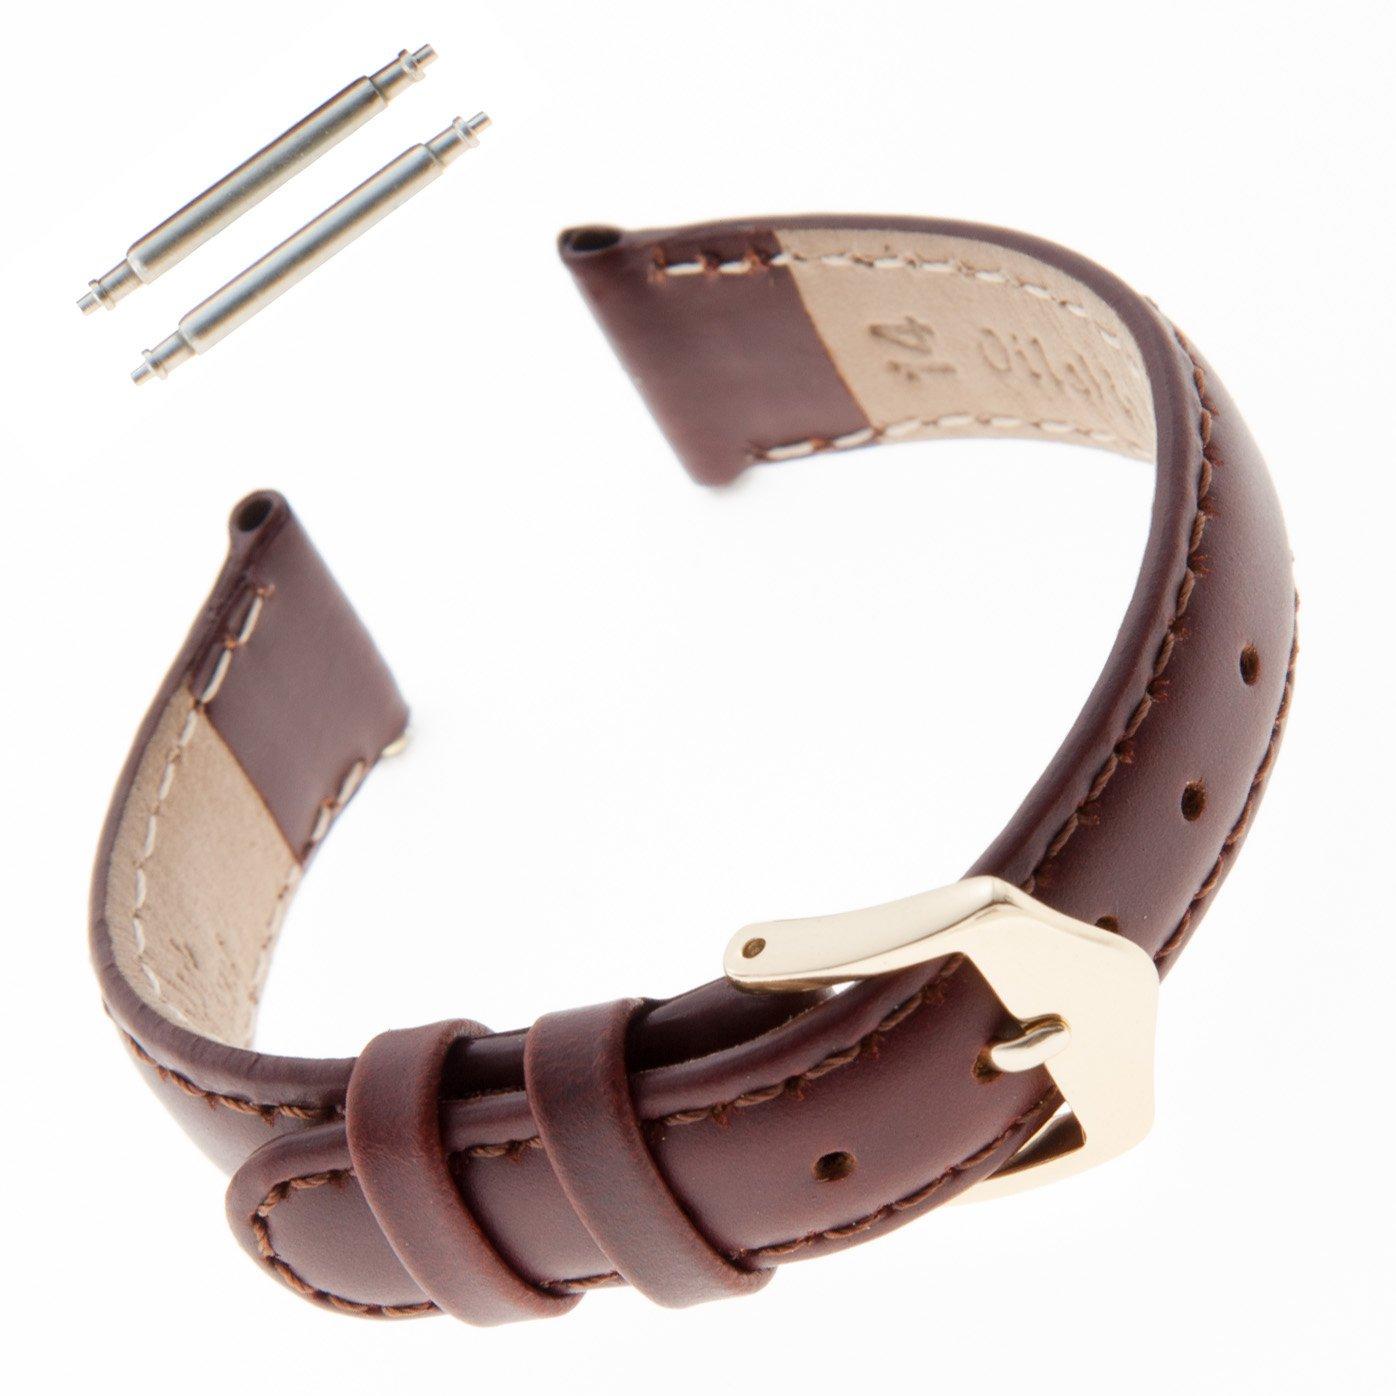 Gilden 10-14mm Water-Resistant Oilskin Leather Ladies Watch Strap MSW63